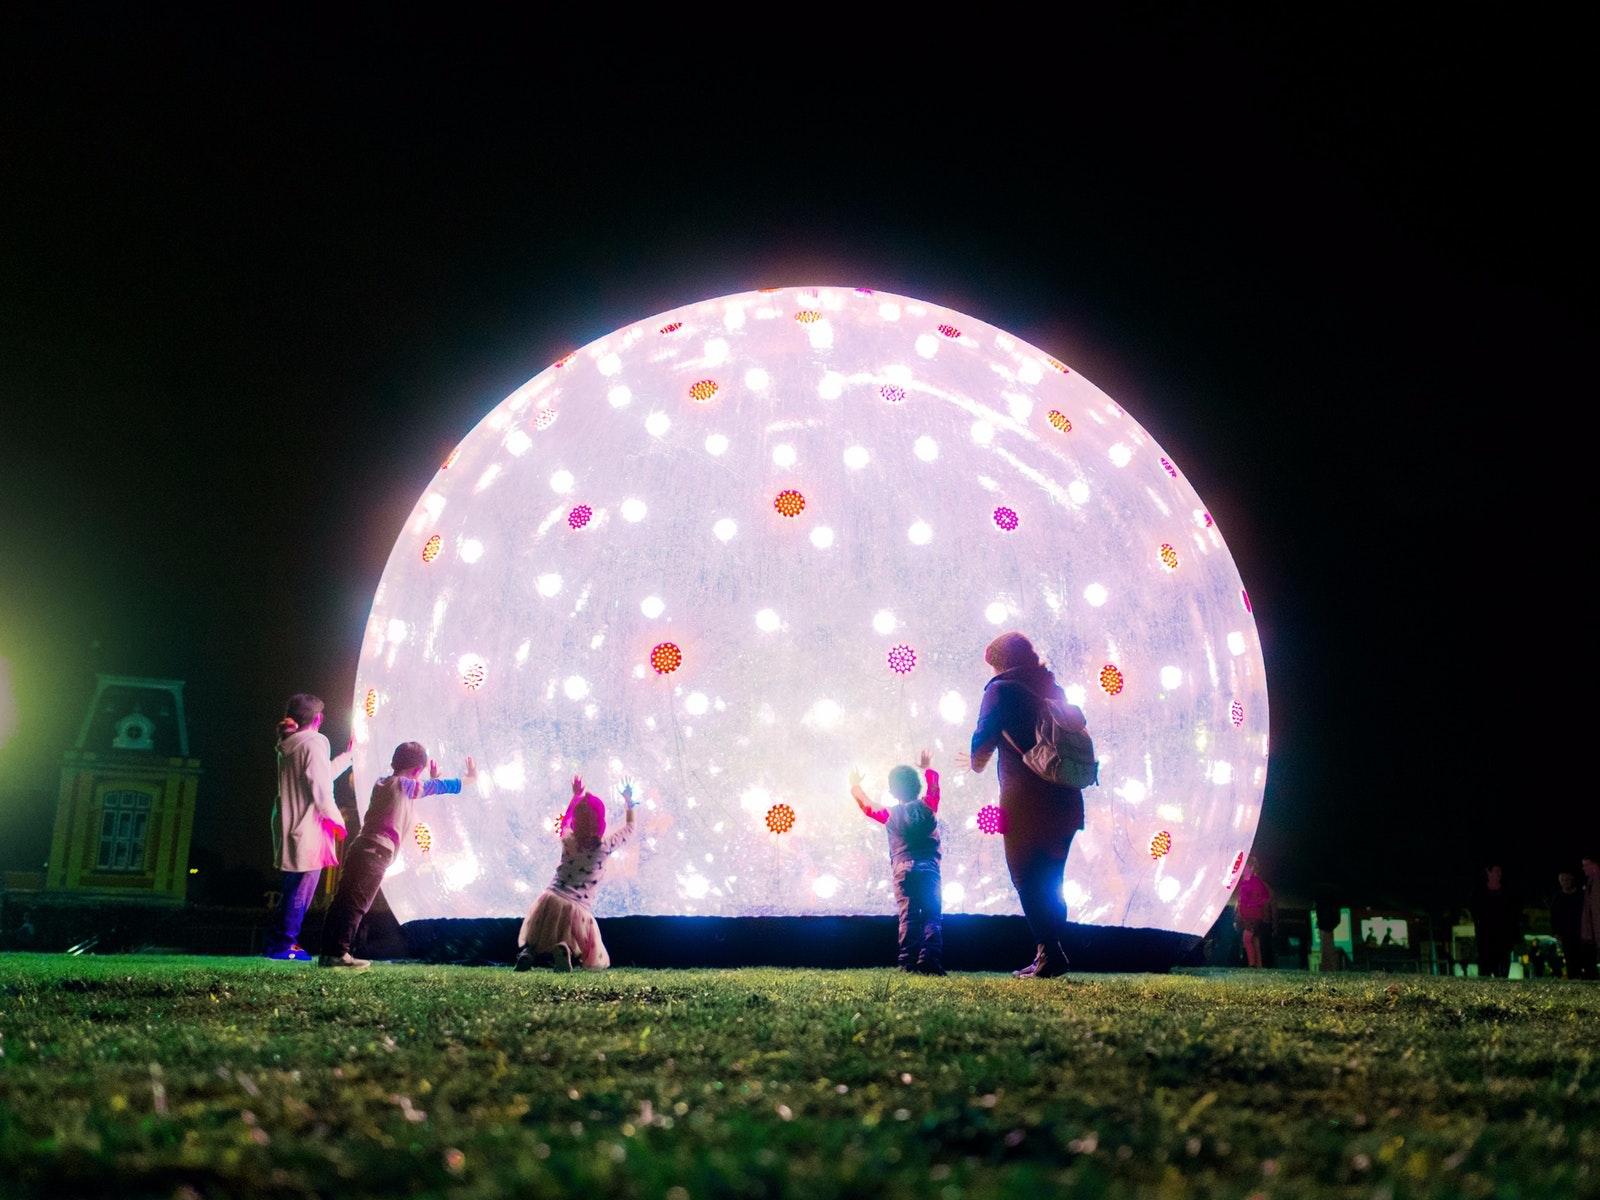 Winter Street Party - Sonic Light Bubble - Weribee City Centre